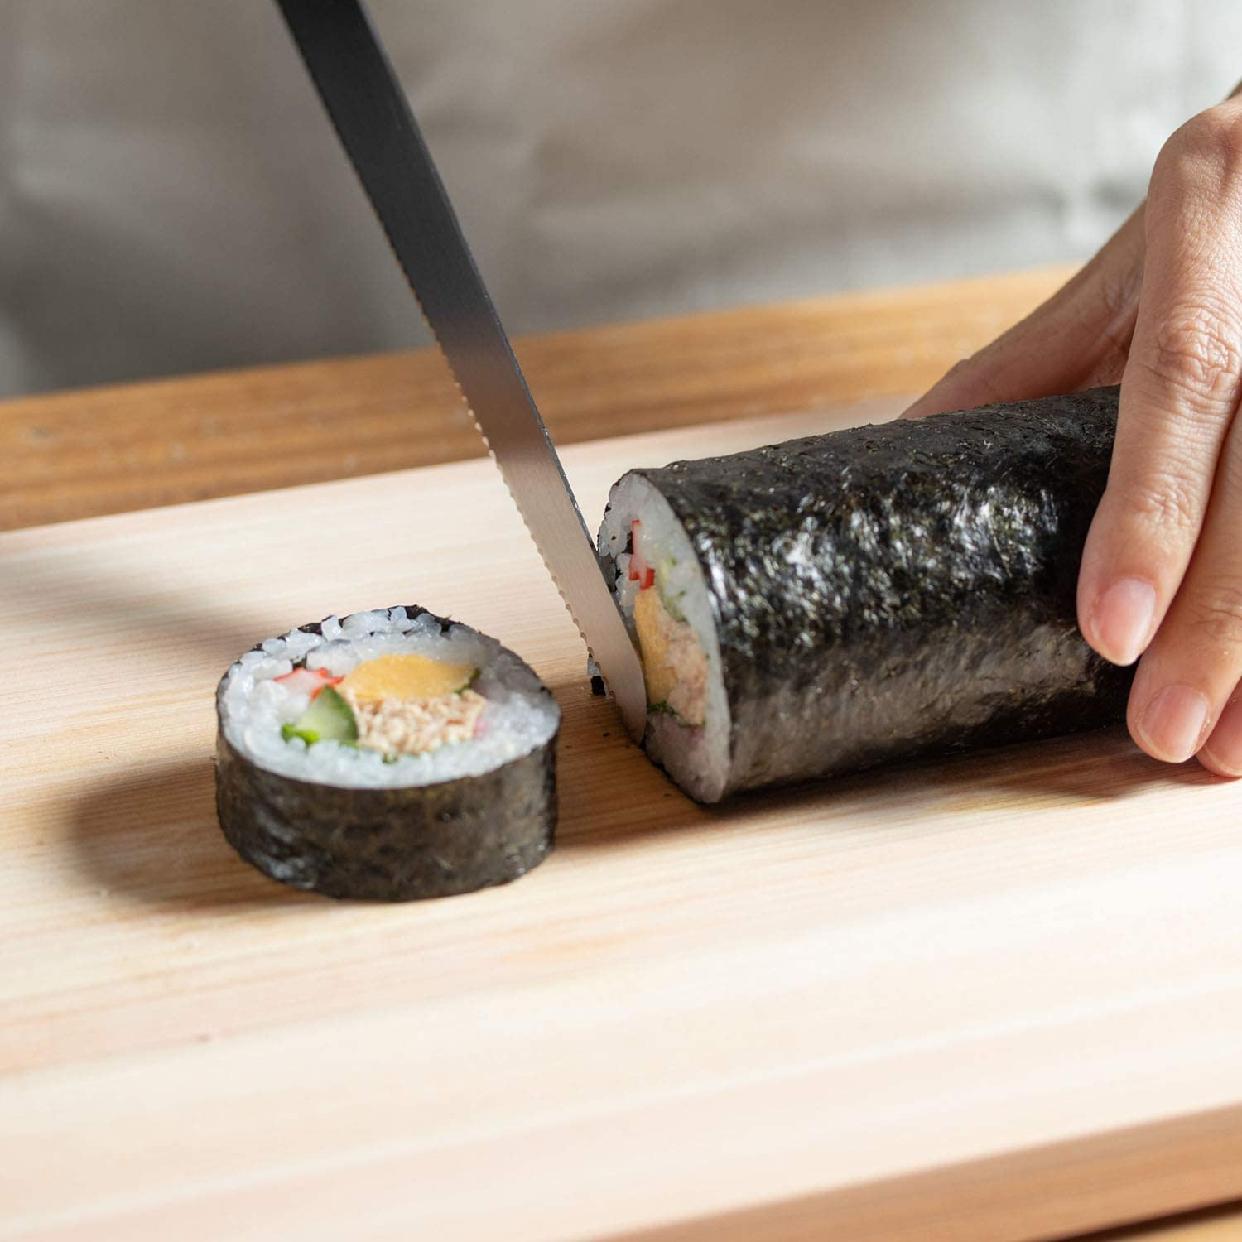 SUNCRAFT(サンクラフト) スムーズパン切りナイフ HE-2101の商品画像7